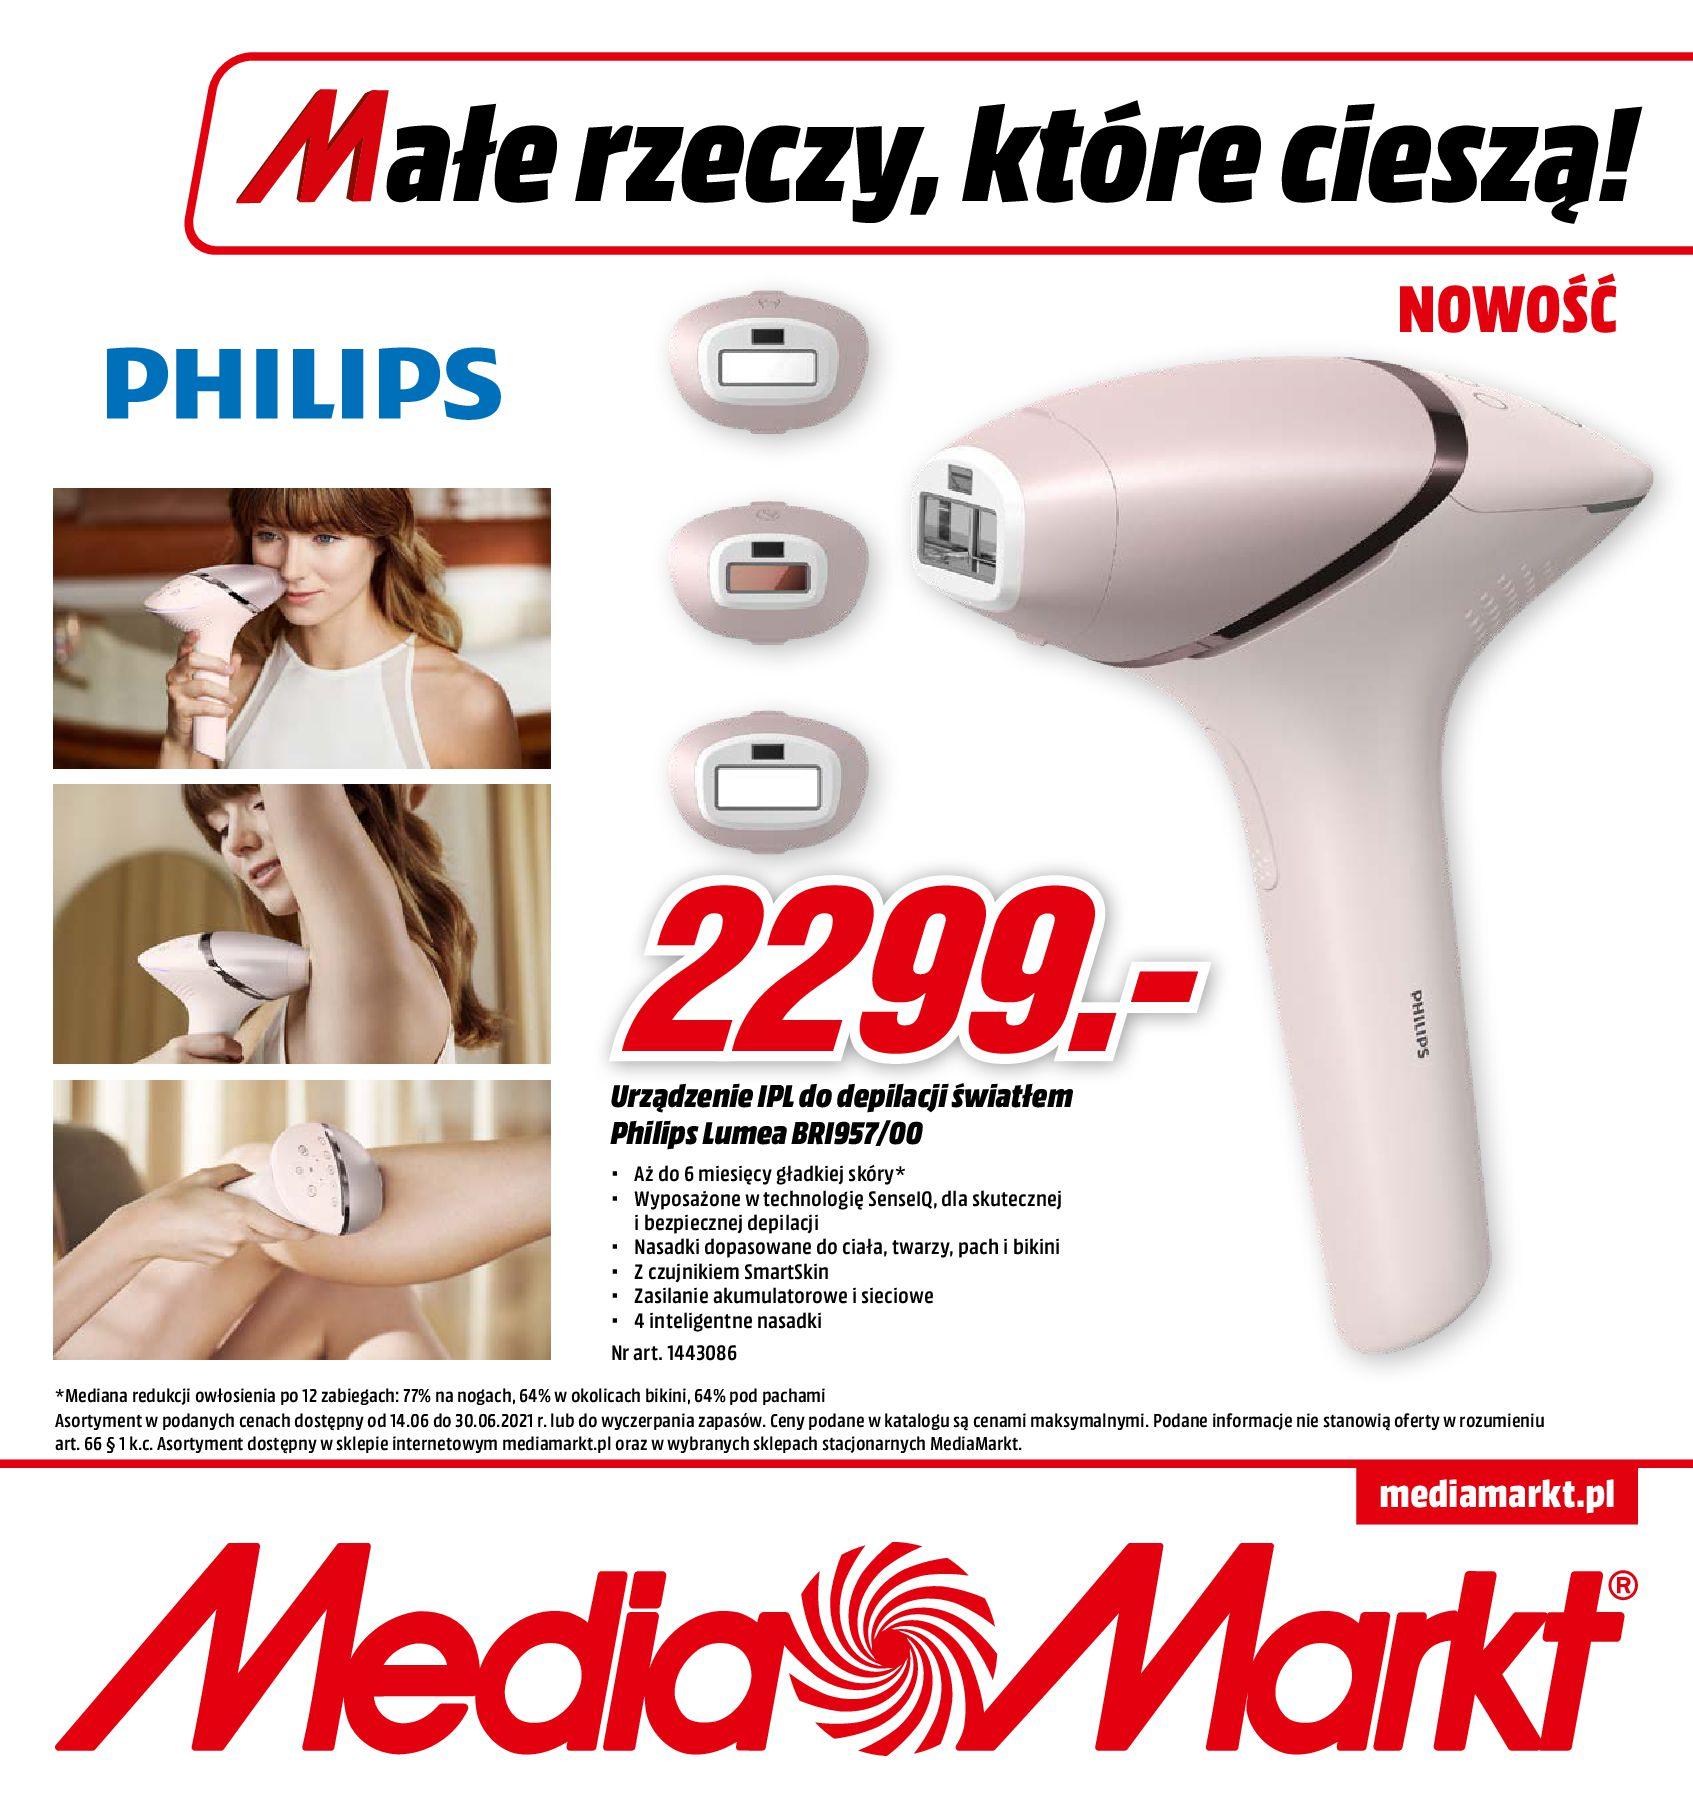 Media Markt:  Gazetka Media Markt - Katalog AGD 15.06.2021